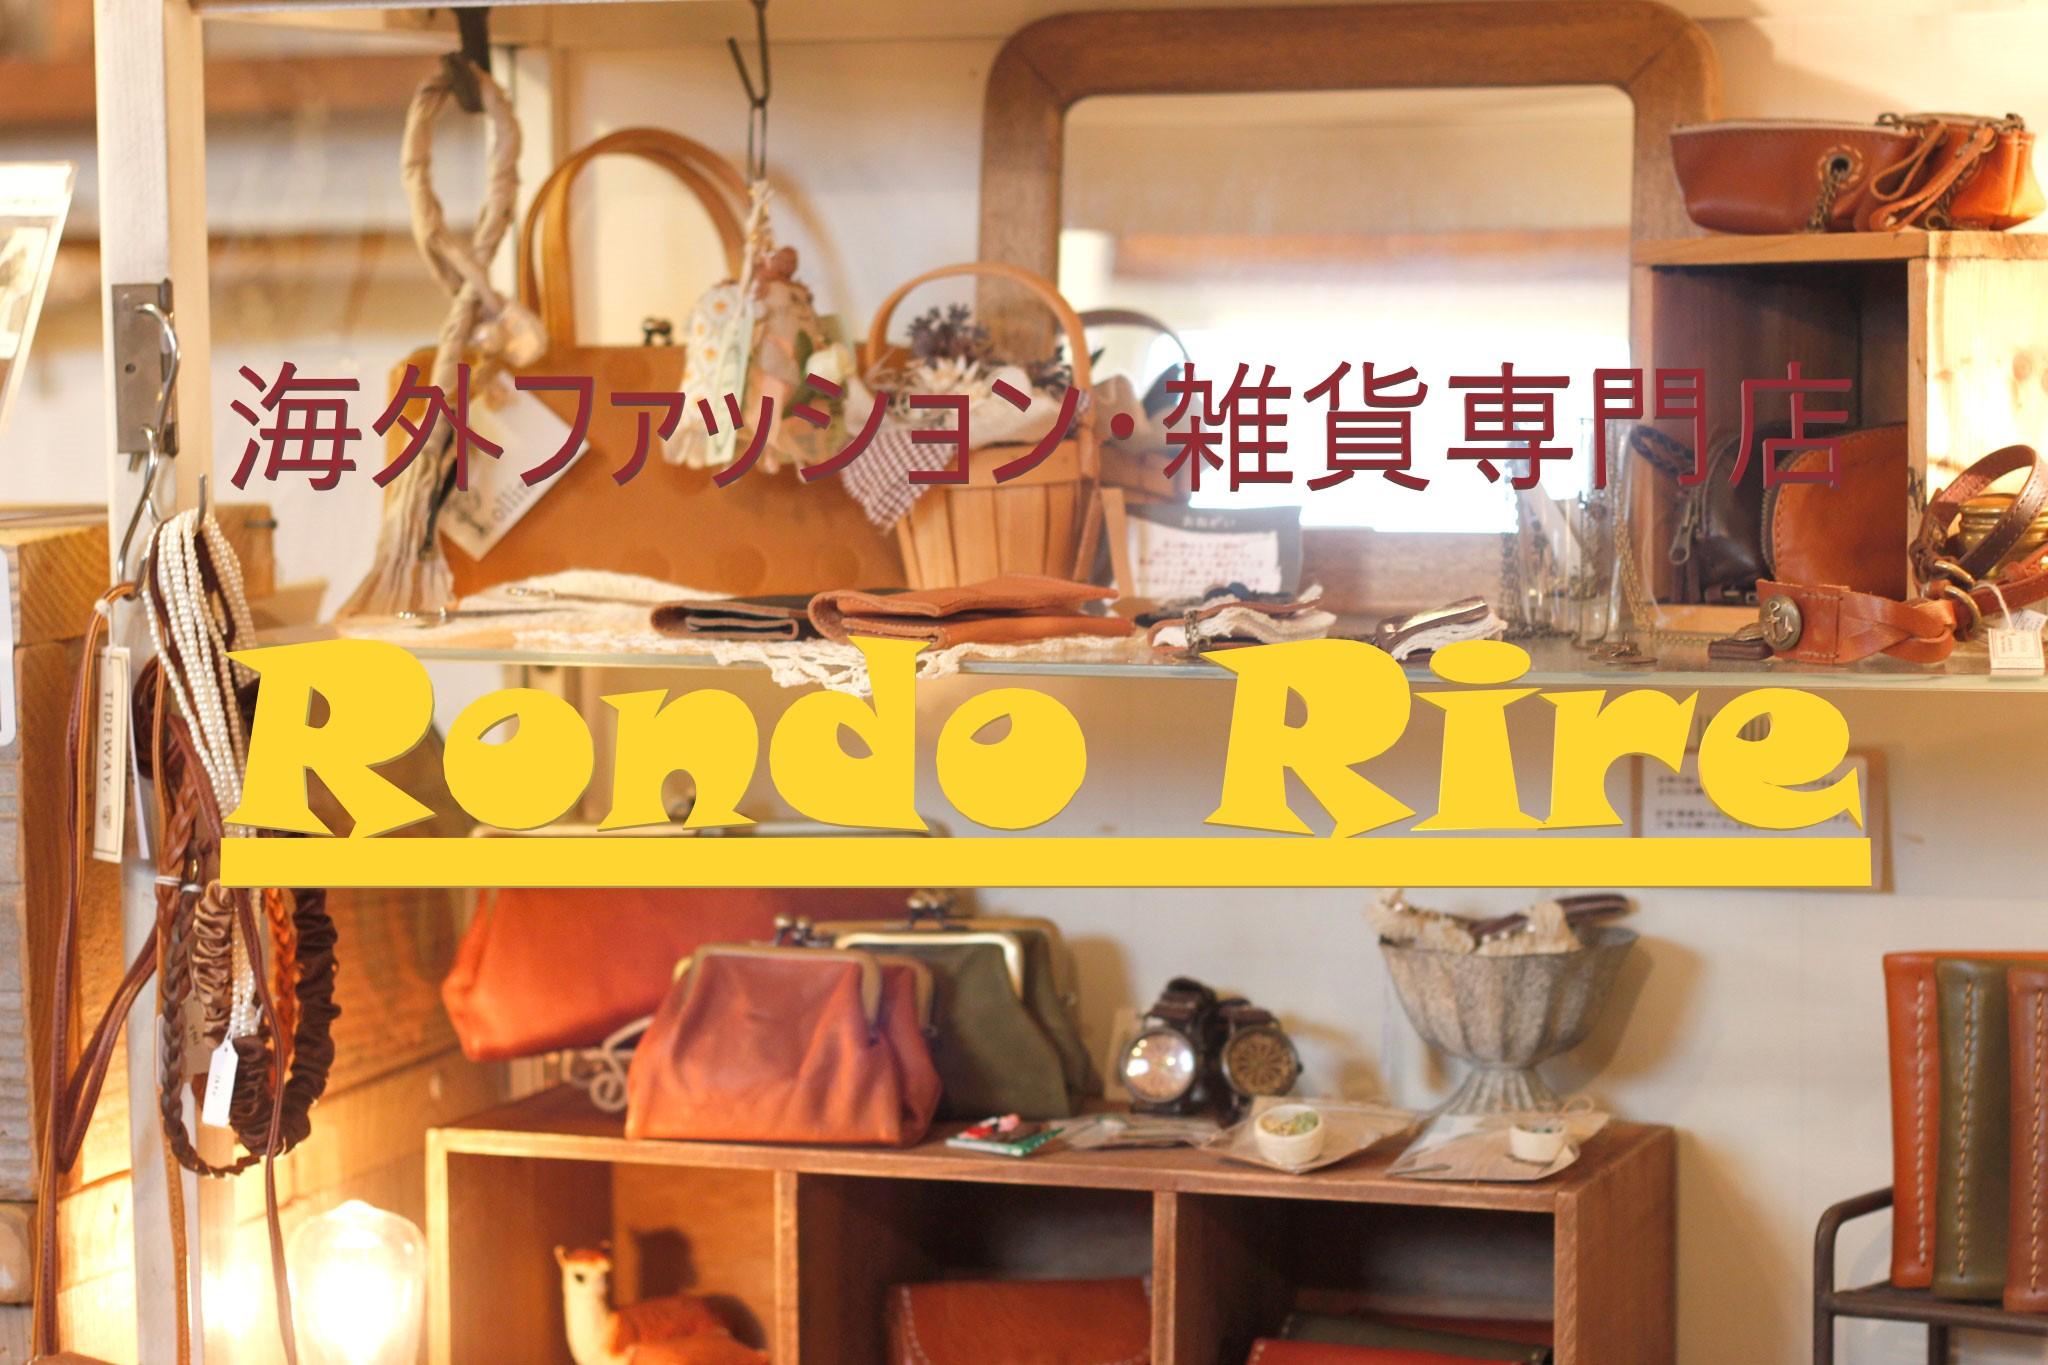 RondoRire【ロンドリール】